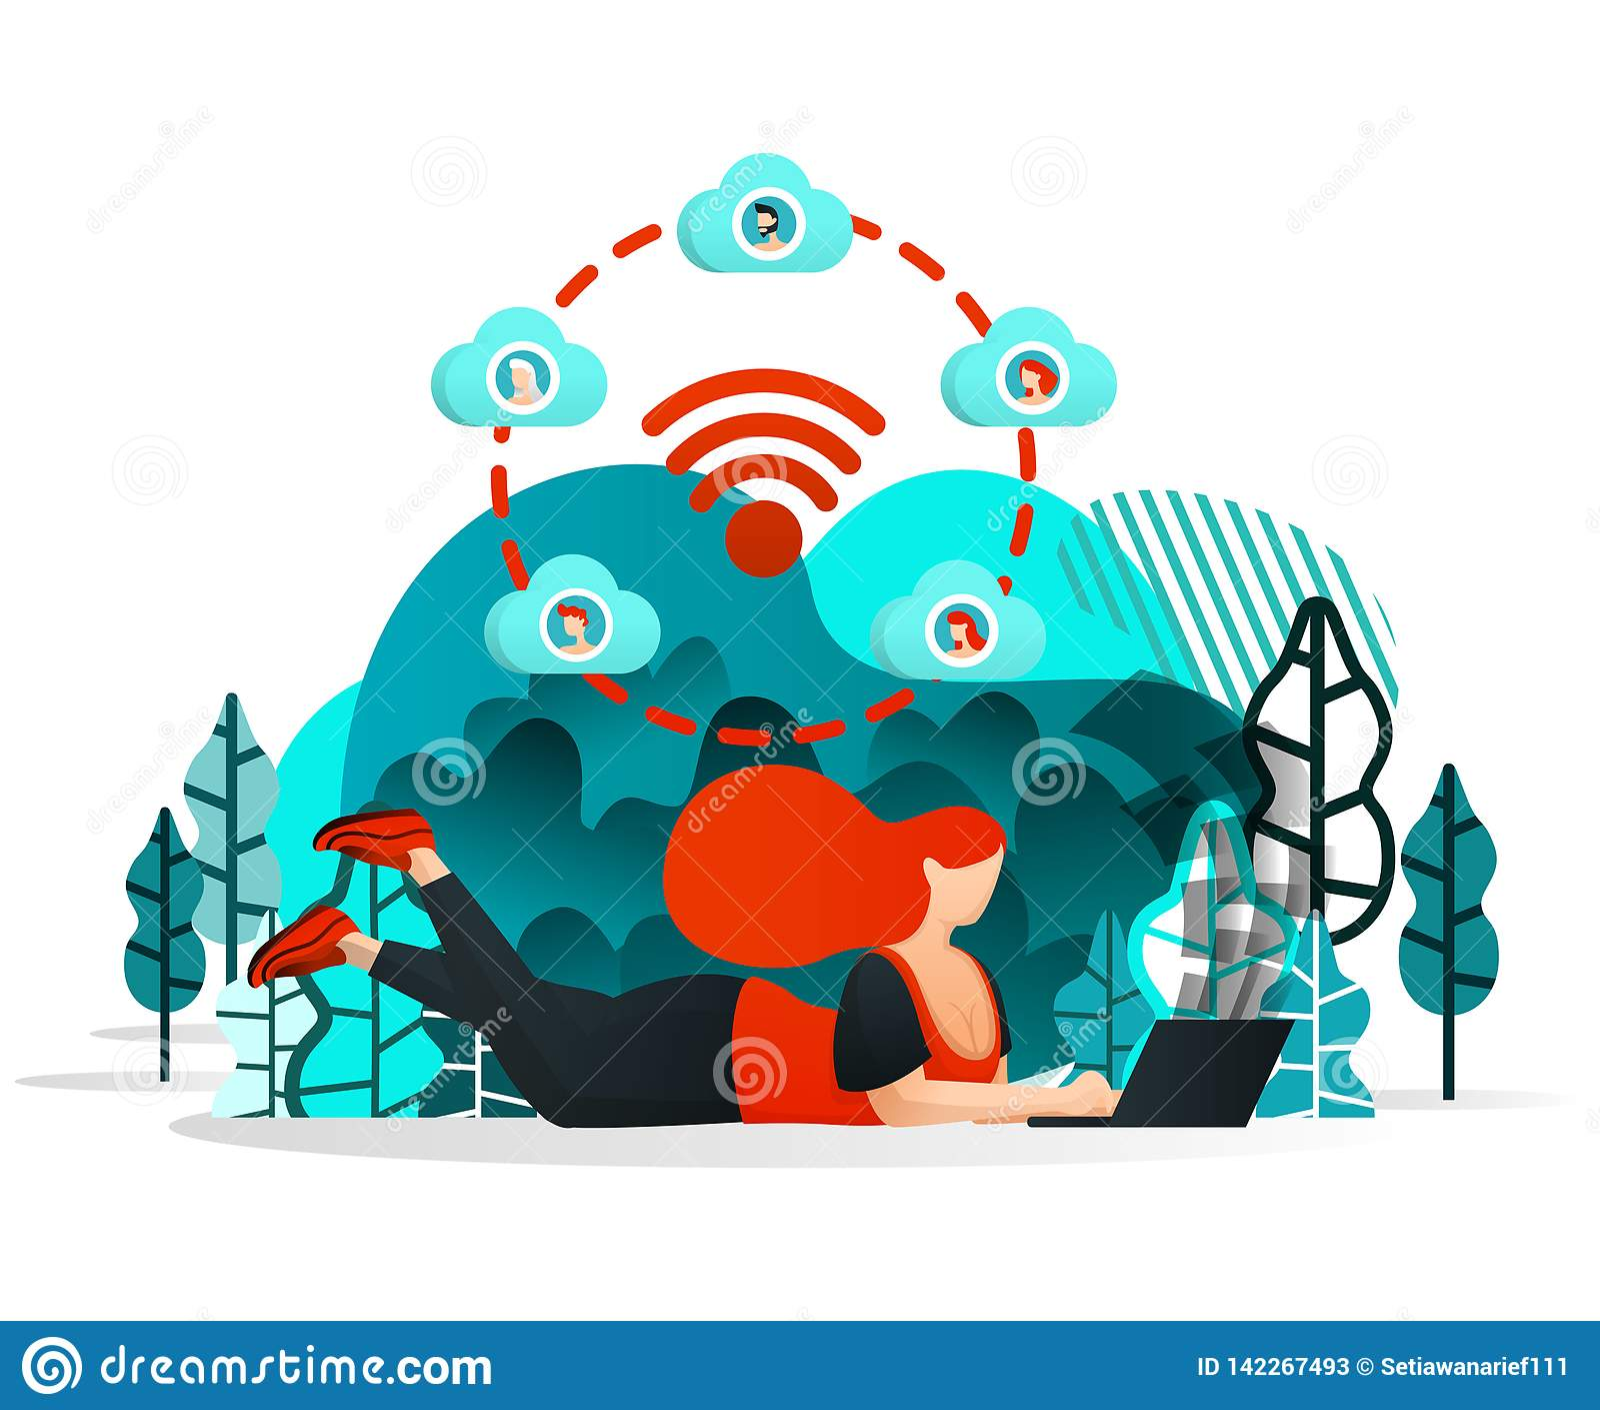 Wifi Cartoon Stock Illustrations 4 840 Wifi Cartoon Stock Illustrations Vectors Clipart Dreamstime